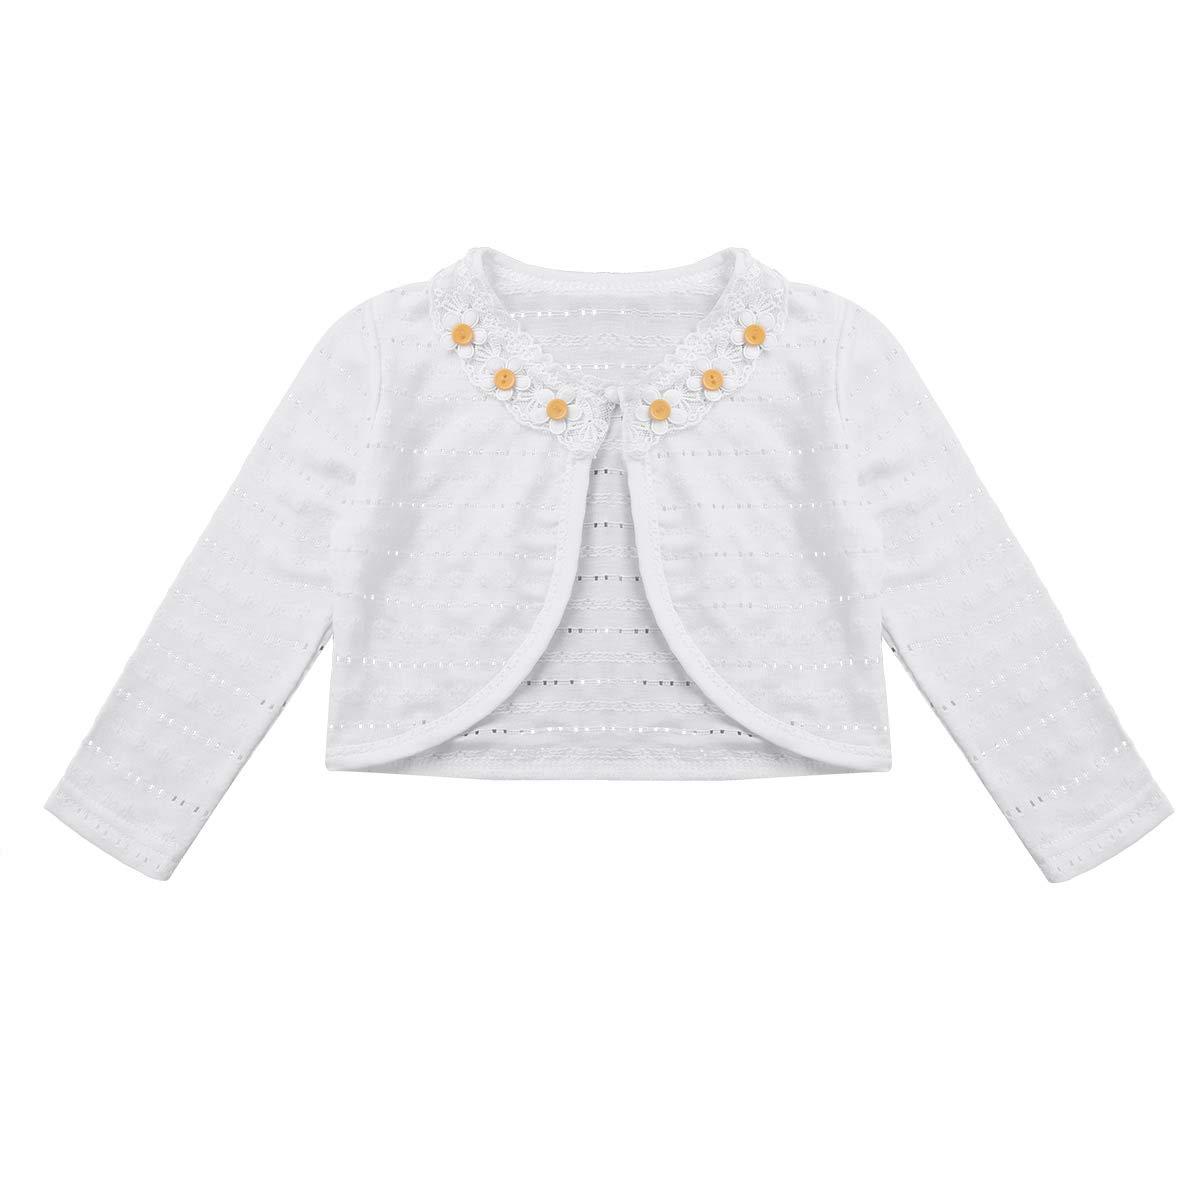 Freebily Kids Girls Long Sleeve Lace Flower One Clasp Closure Hollow Bolero Shrug Cardigan Top Type B White 3-4